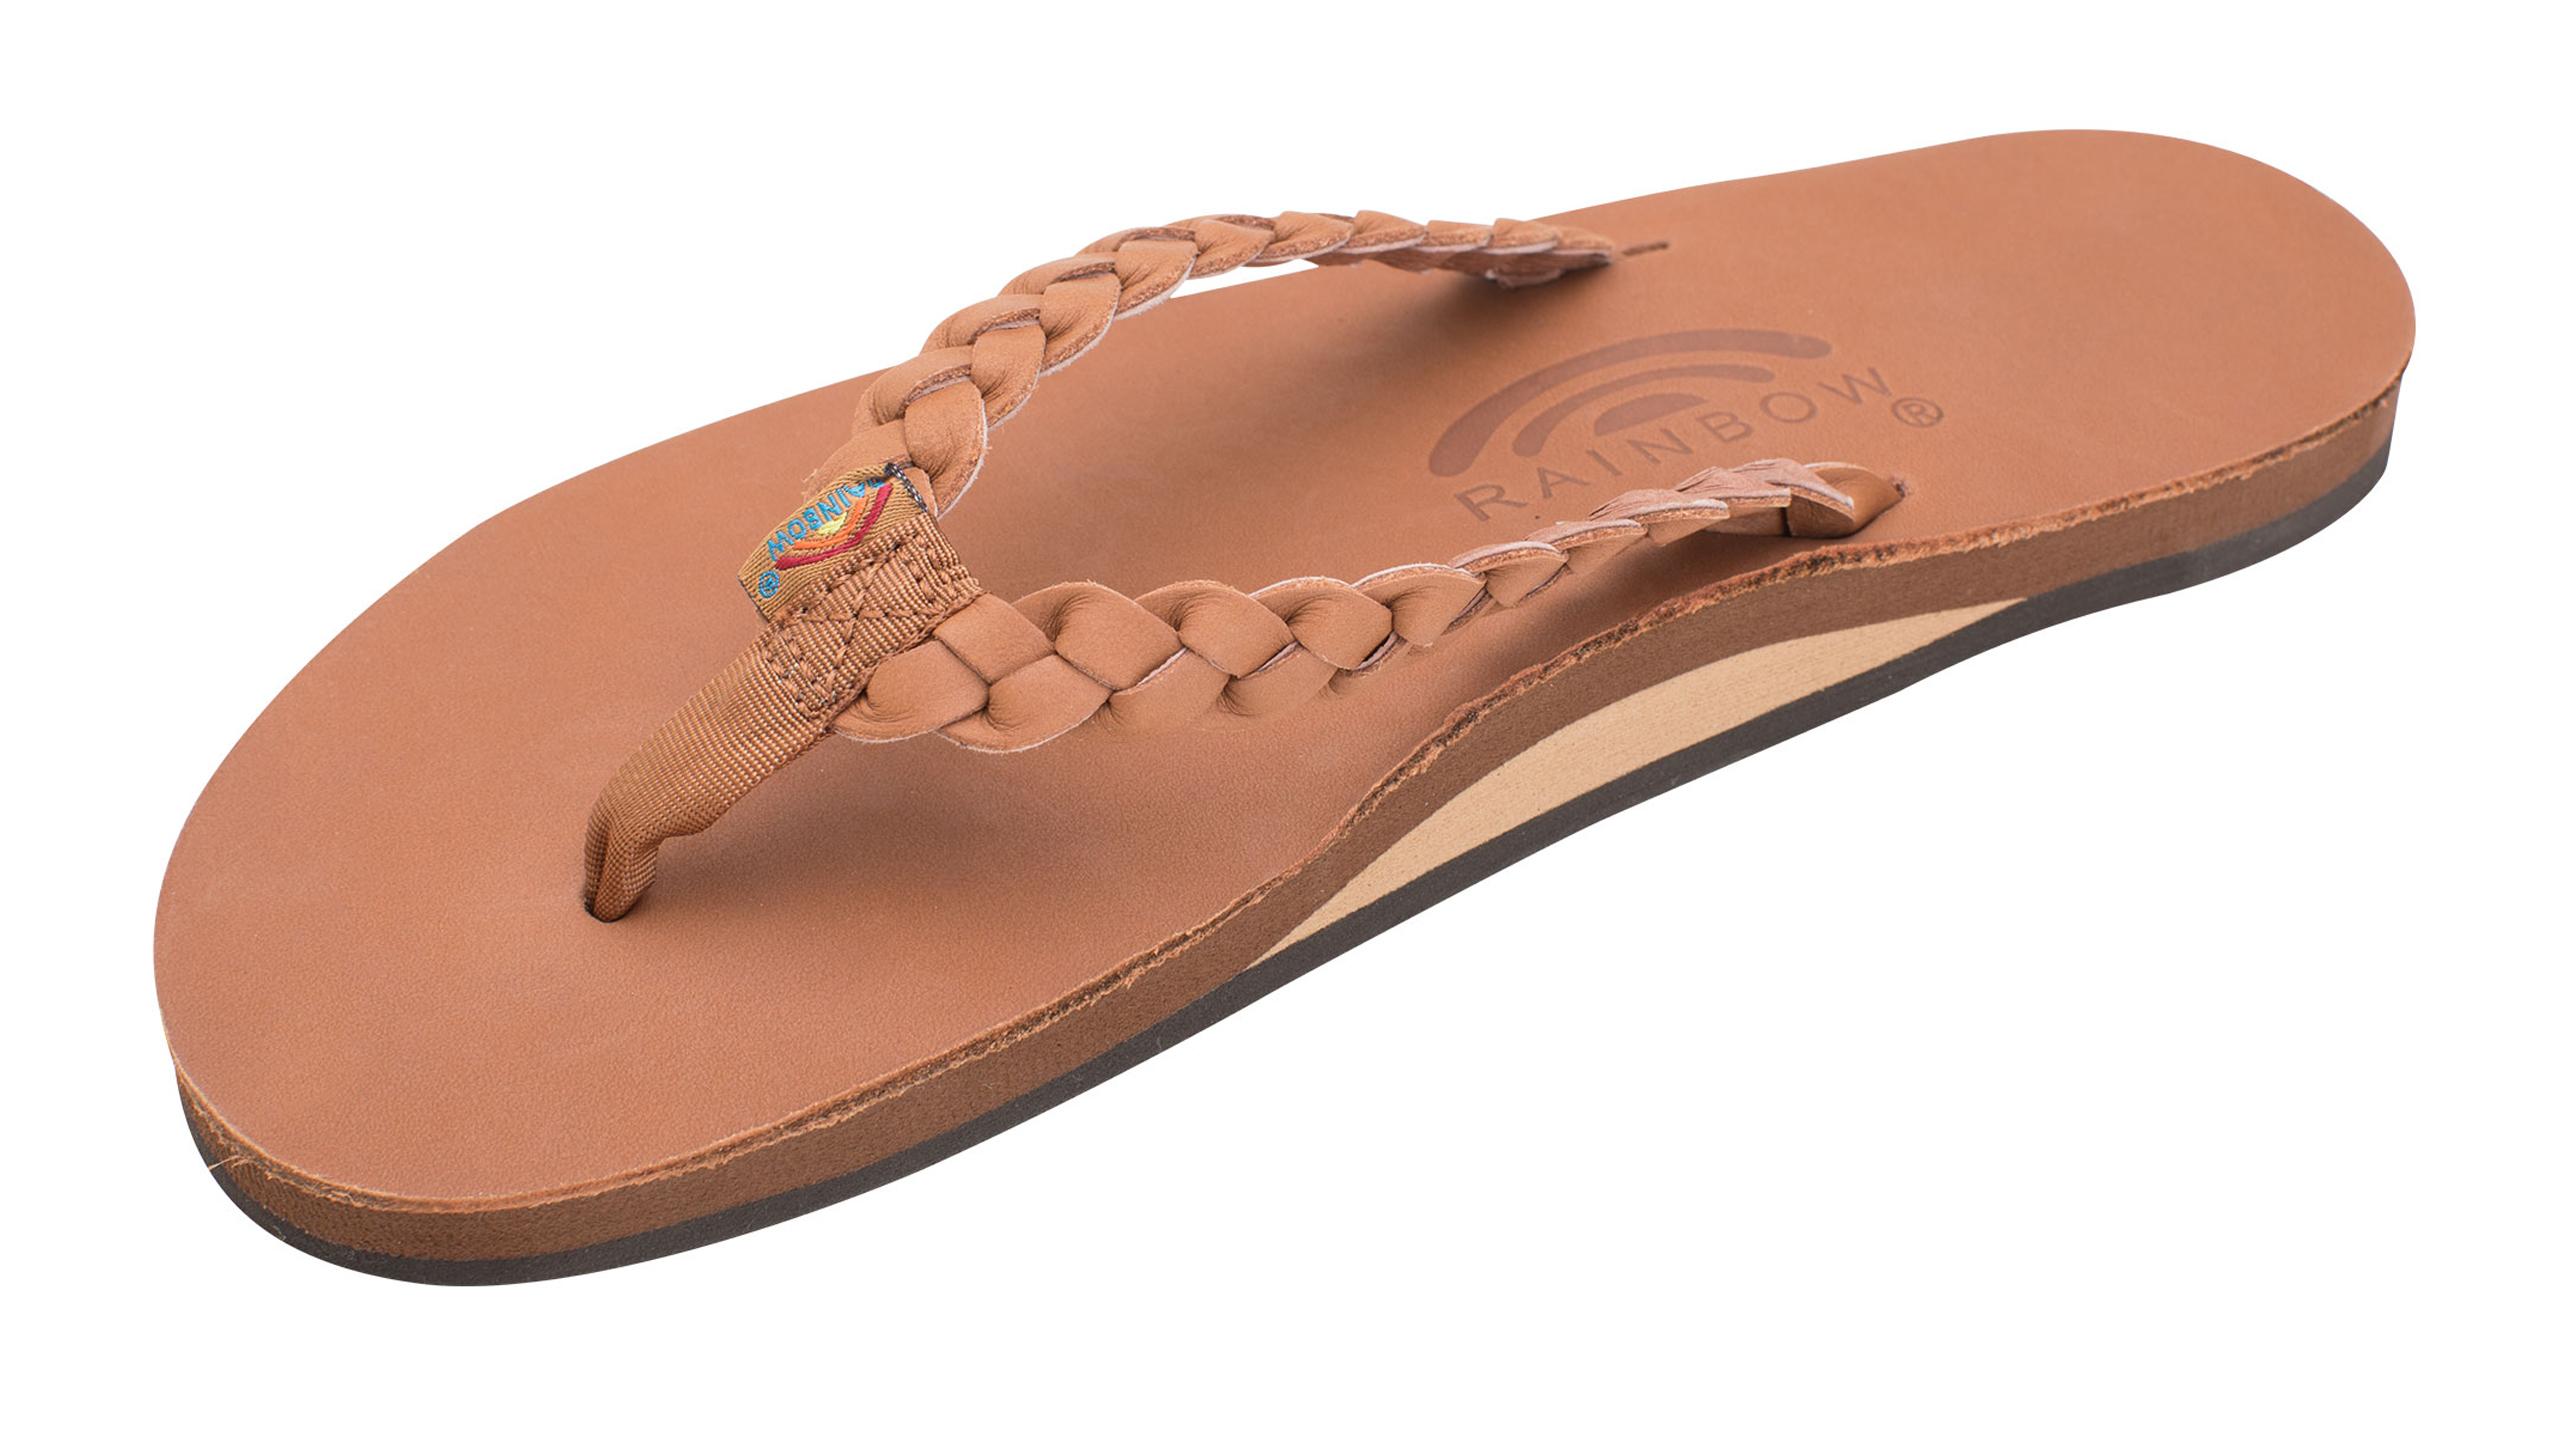 301ALDBS_LADIES - Rainbow Sandals